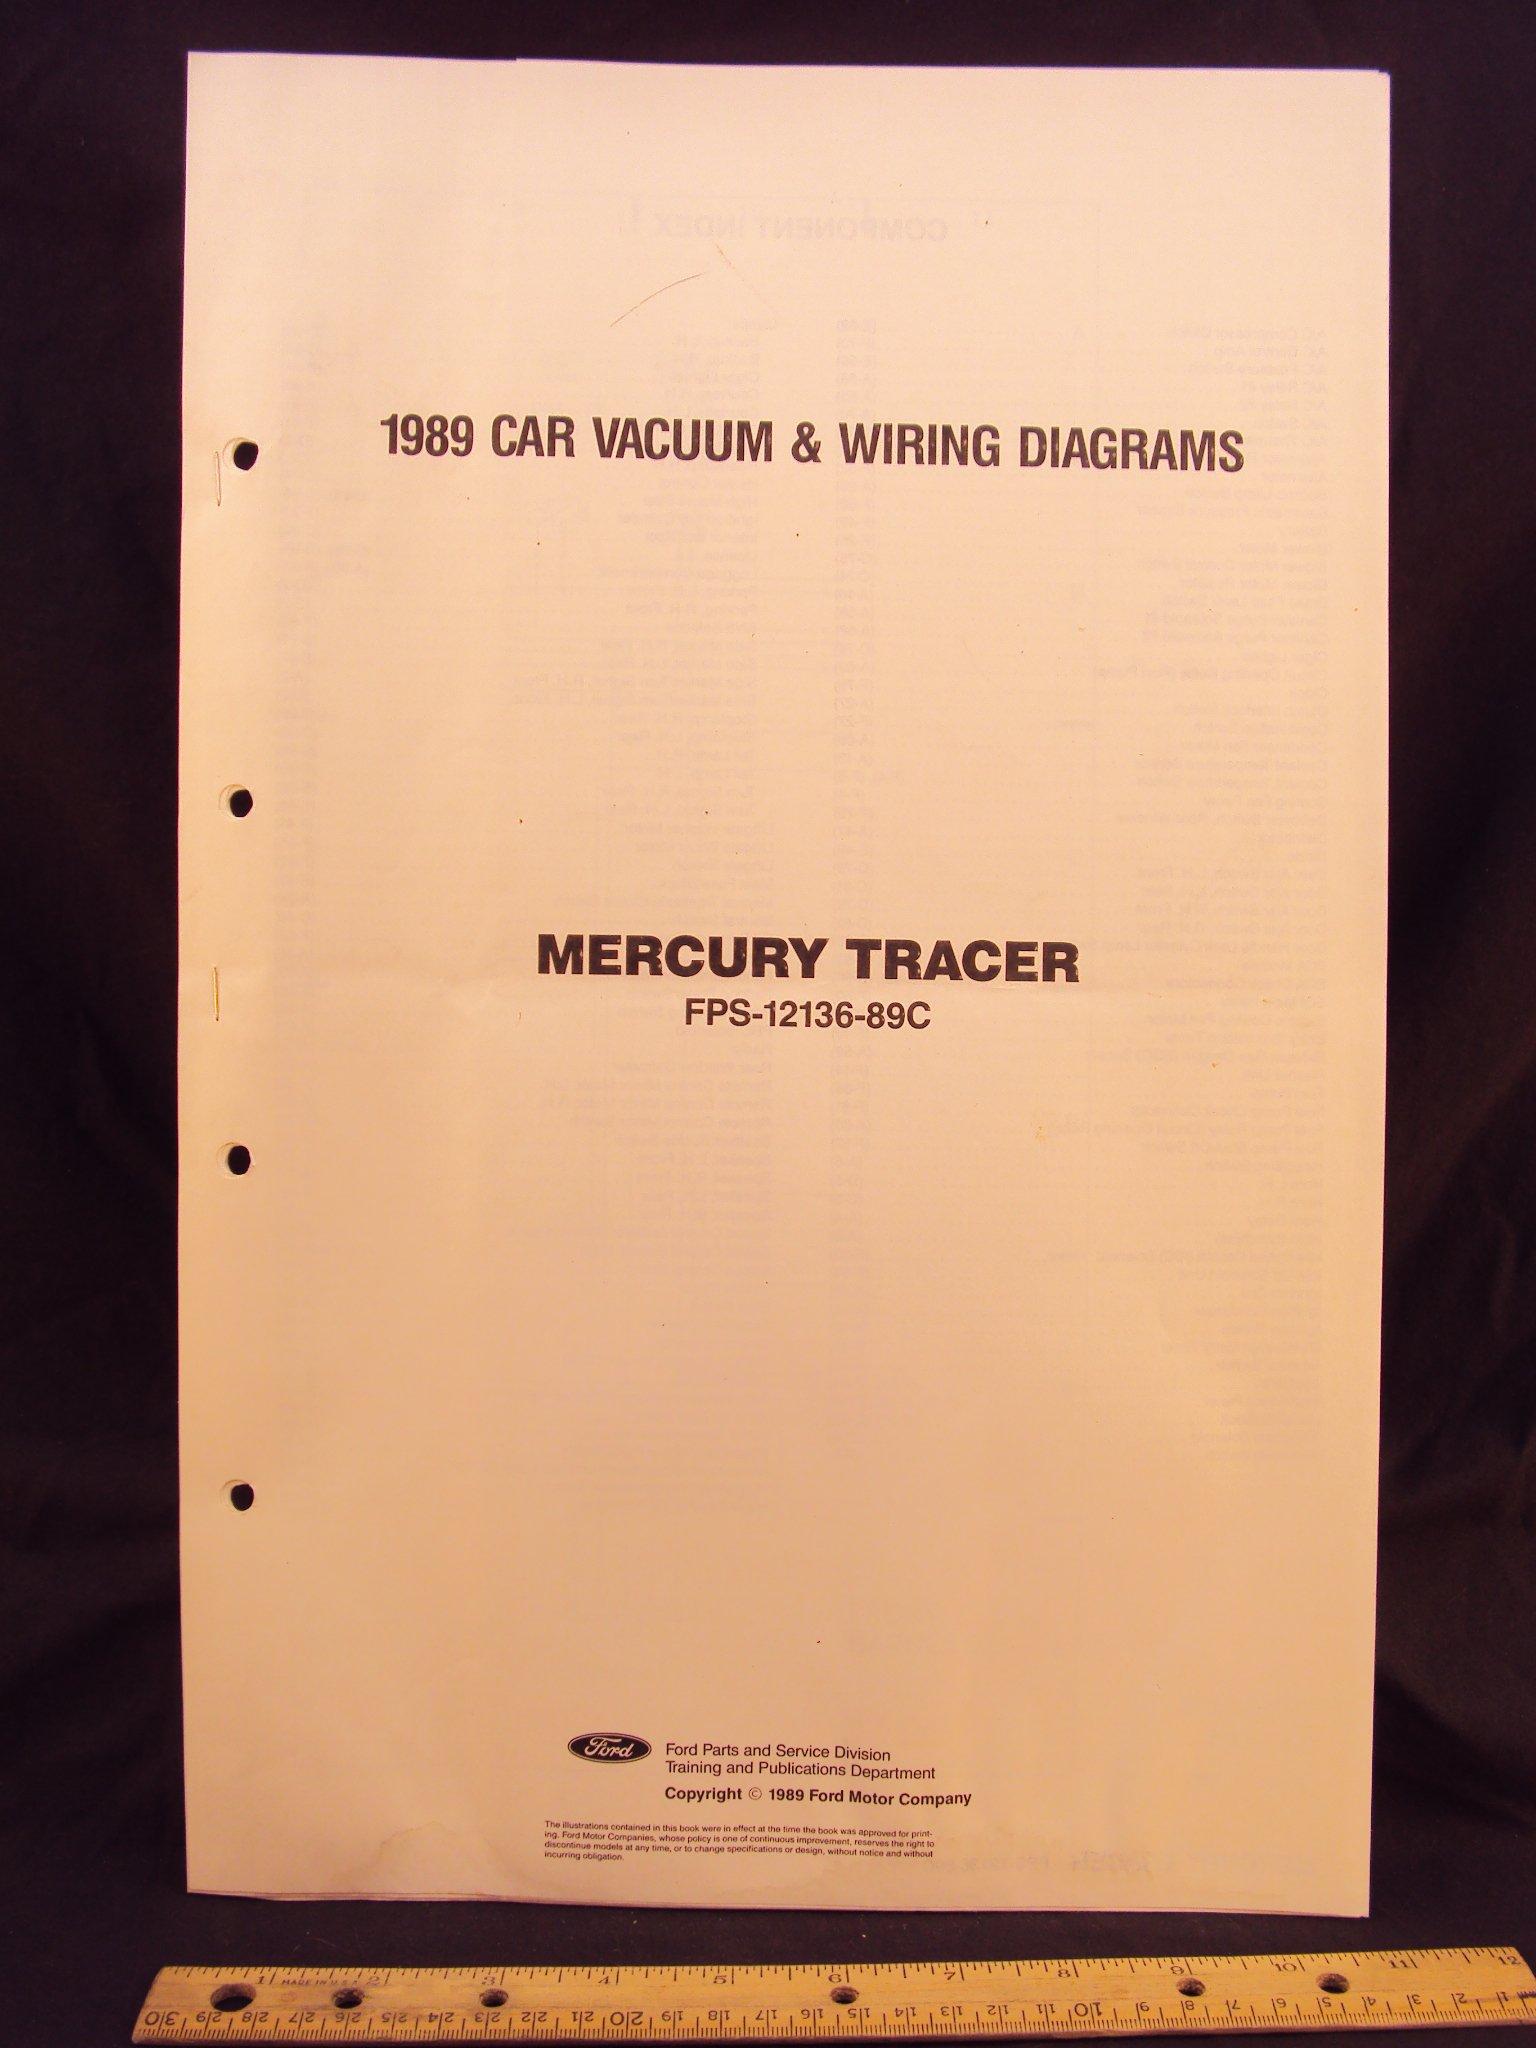 [QMVU_8575]  MX_2367] 1989 Mercury Tracer Wiring Diagram Schematic Wiring | 1991 Mercury Tracer Diagram Wiring Schematic |  | Loskopri Oxyl Gresi Nful Mohammedshrine Librar Wiring 101